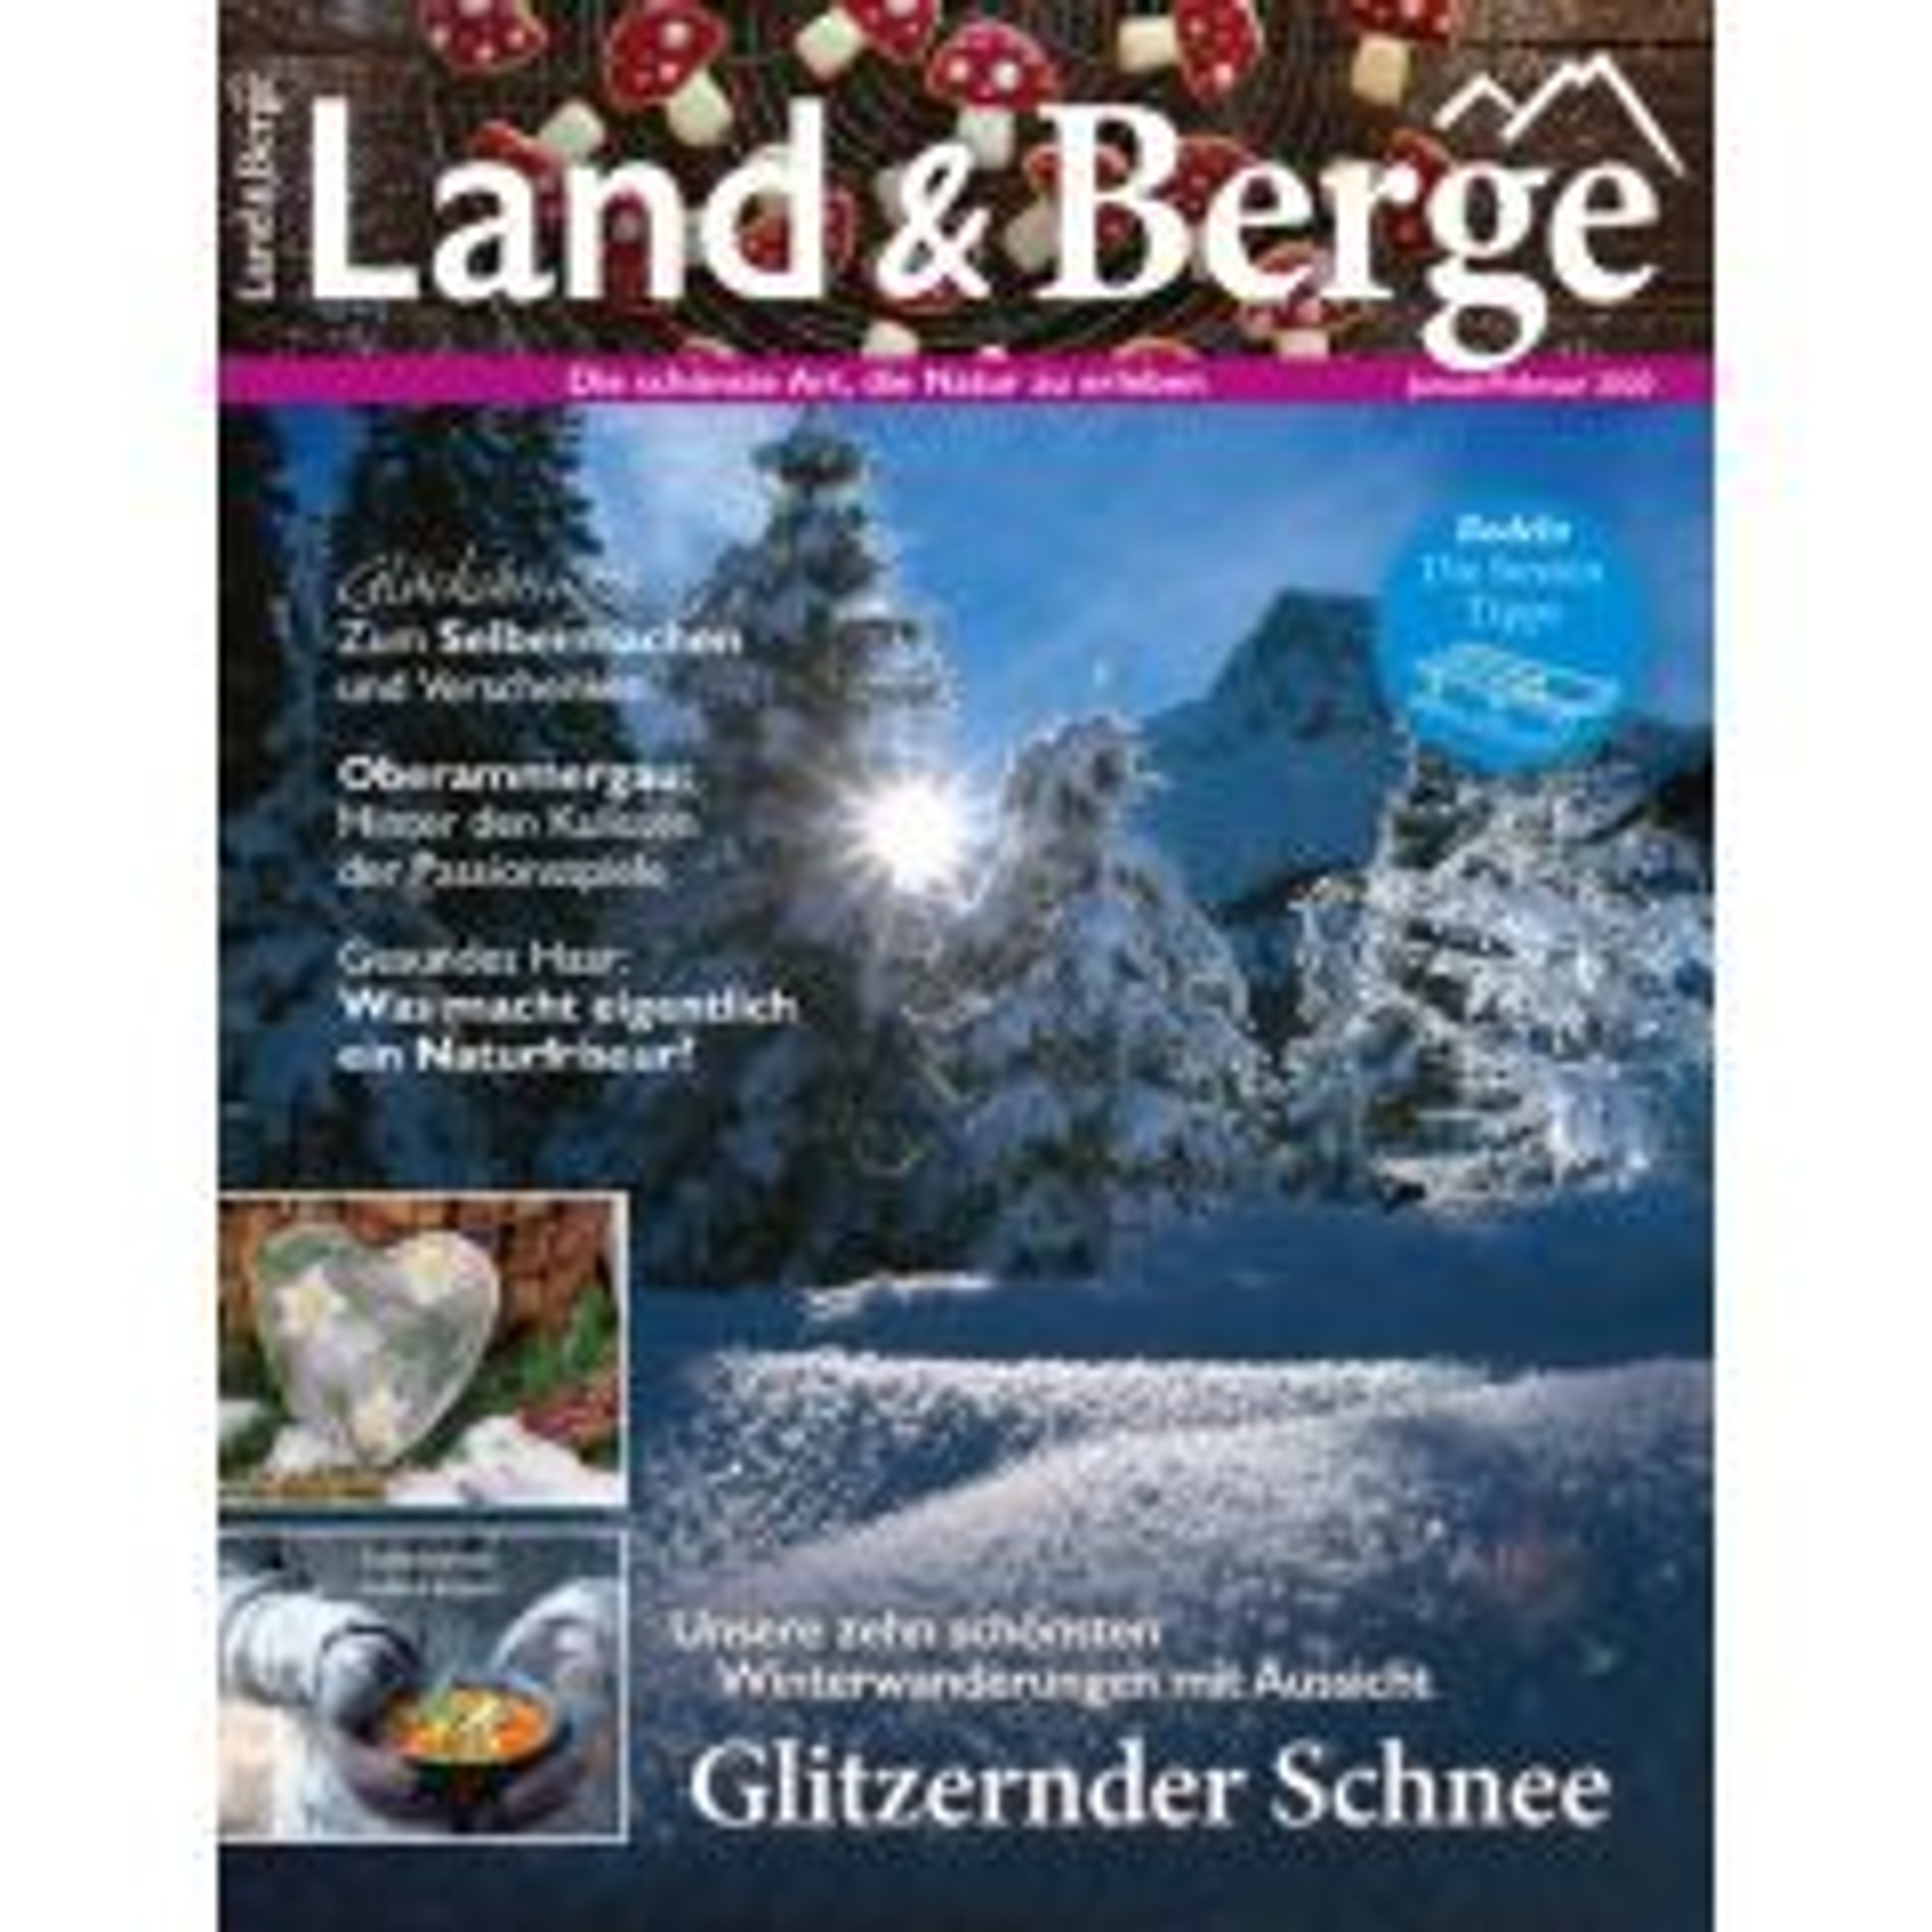 Land & Berge 1/2020